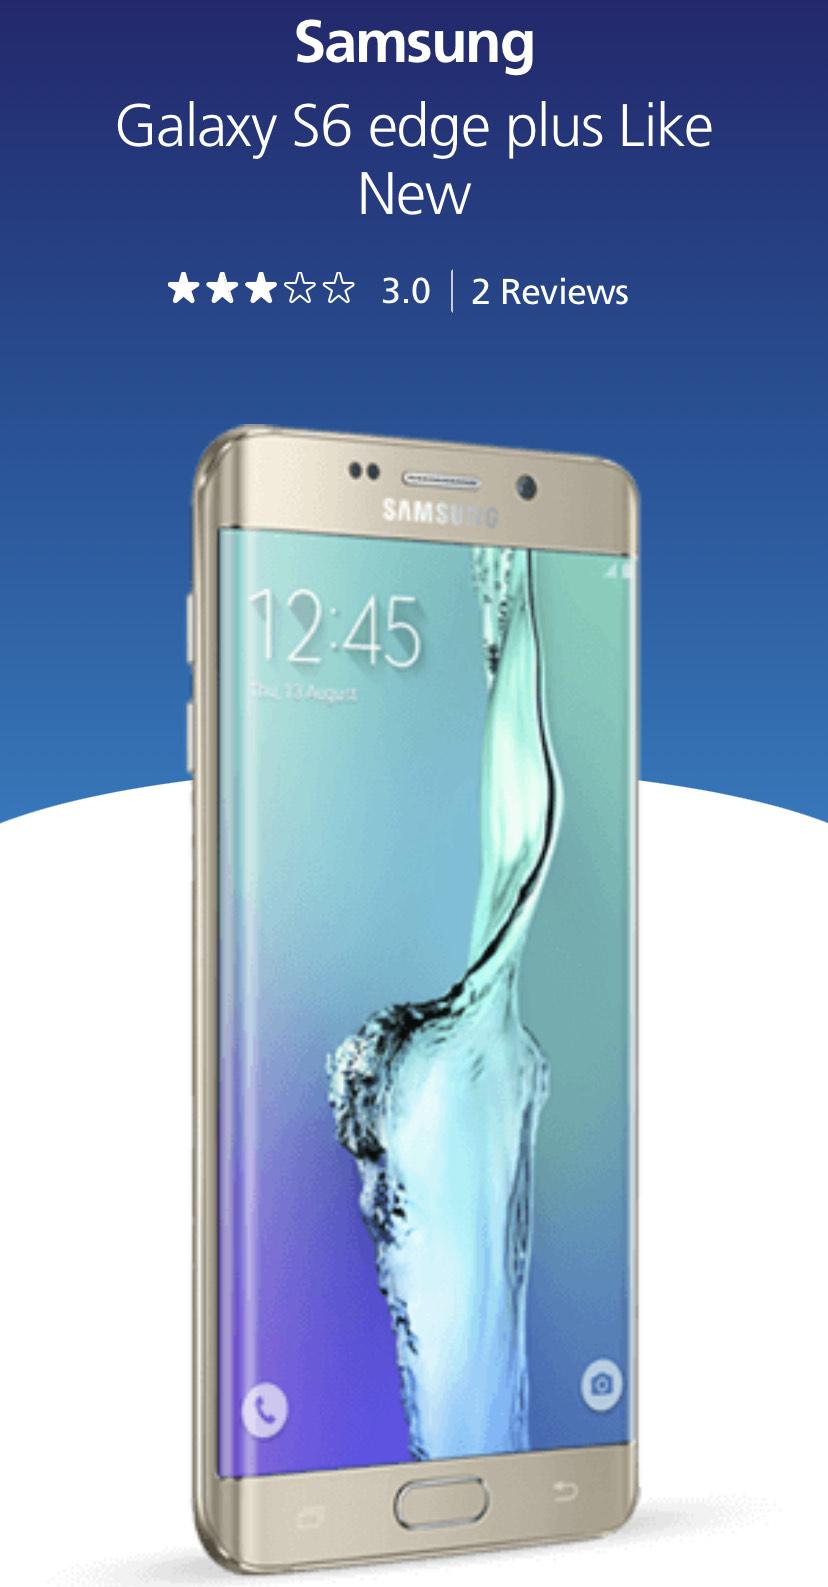 Samsung galaxy s6 edge plus like new - £79 @ O2 Shop